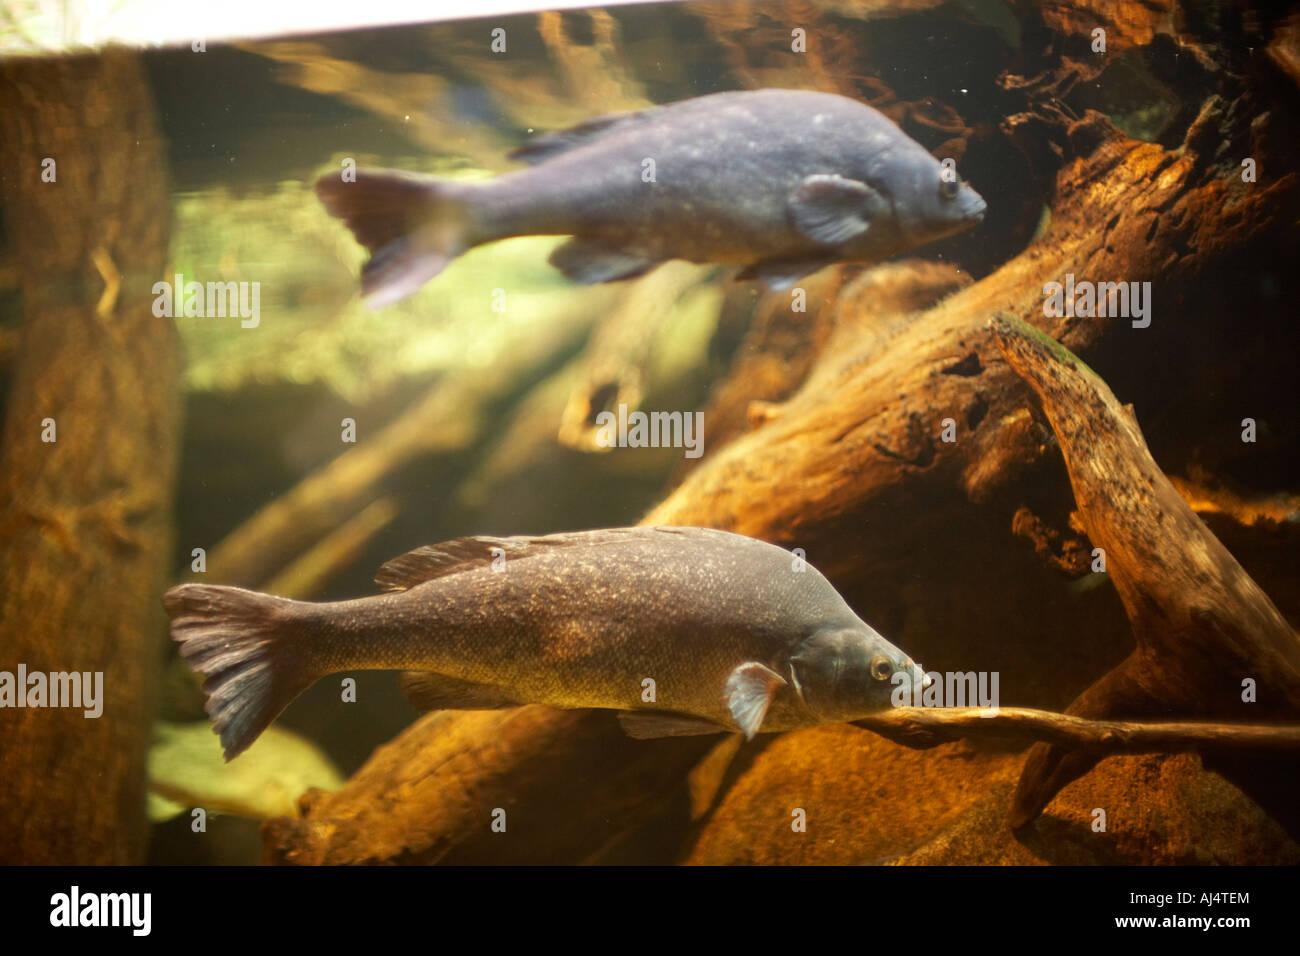 Freshwater fish in australia - Freshwater Fish In Sydney Aquarium Darling Harbour New South Wales Nsw Australia Stock Photo